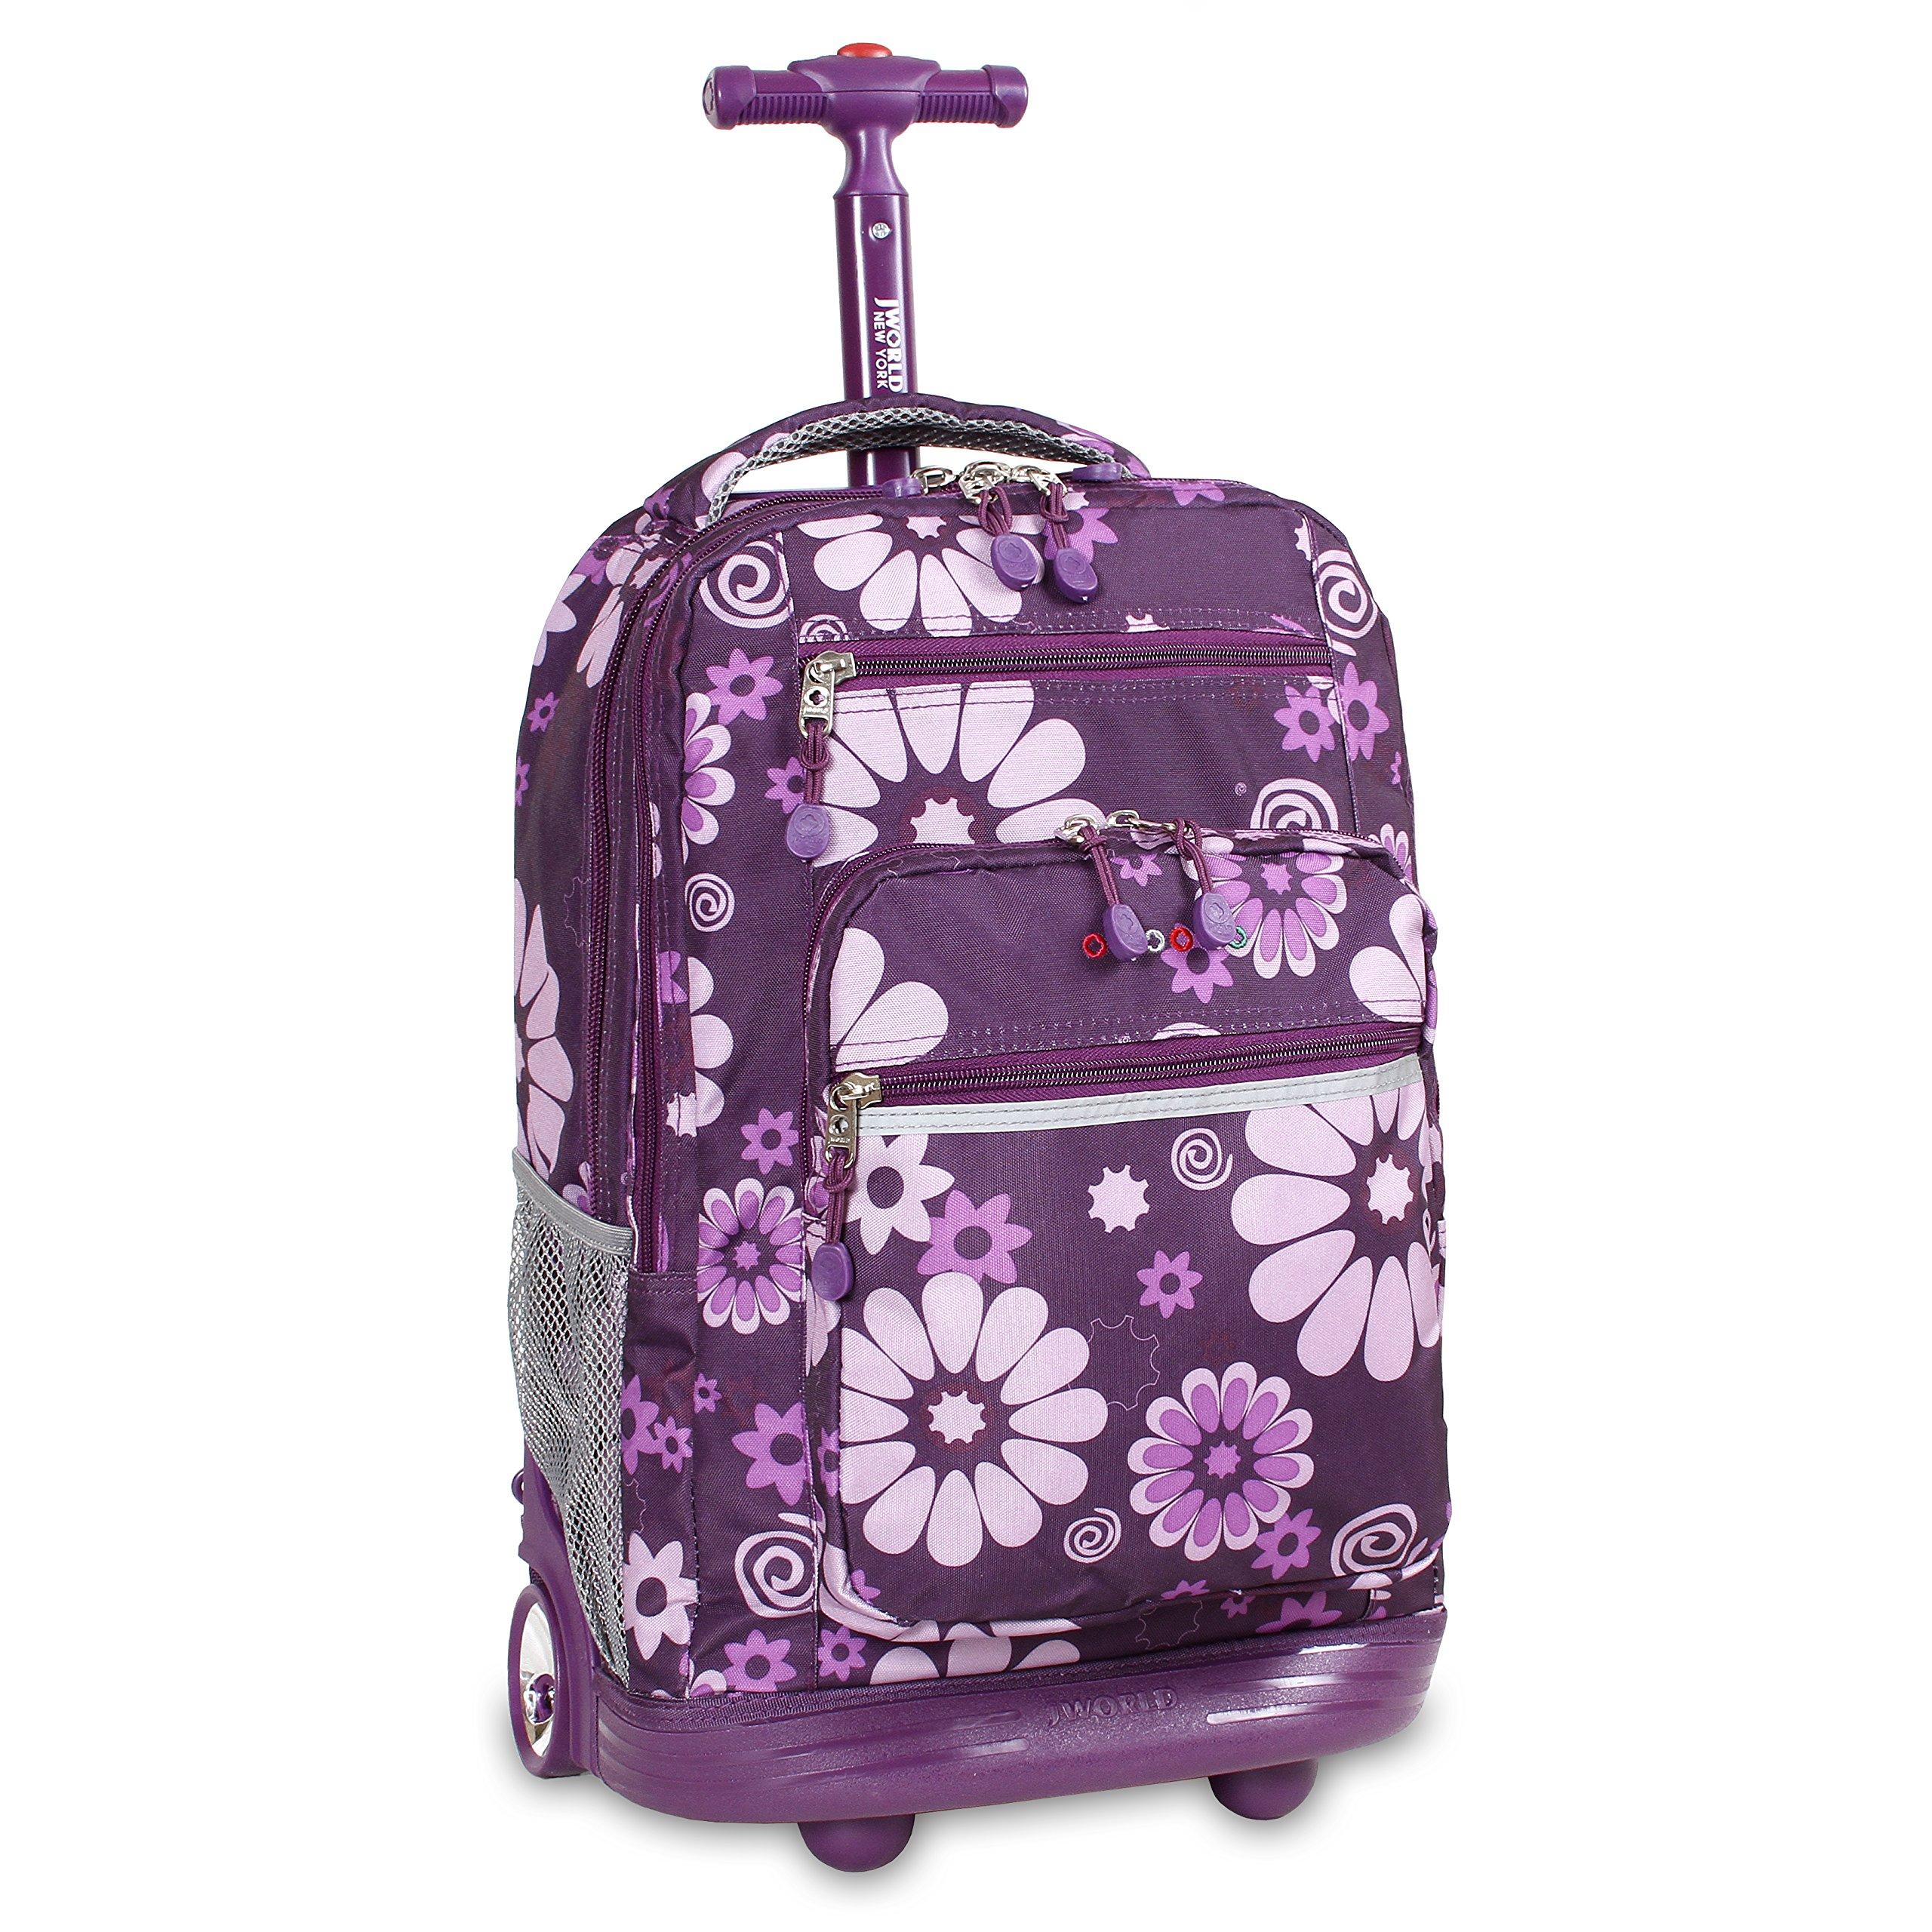 J World New York Sundance Rolling Backpack, Purple Flower, One Size